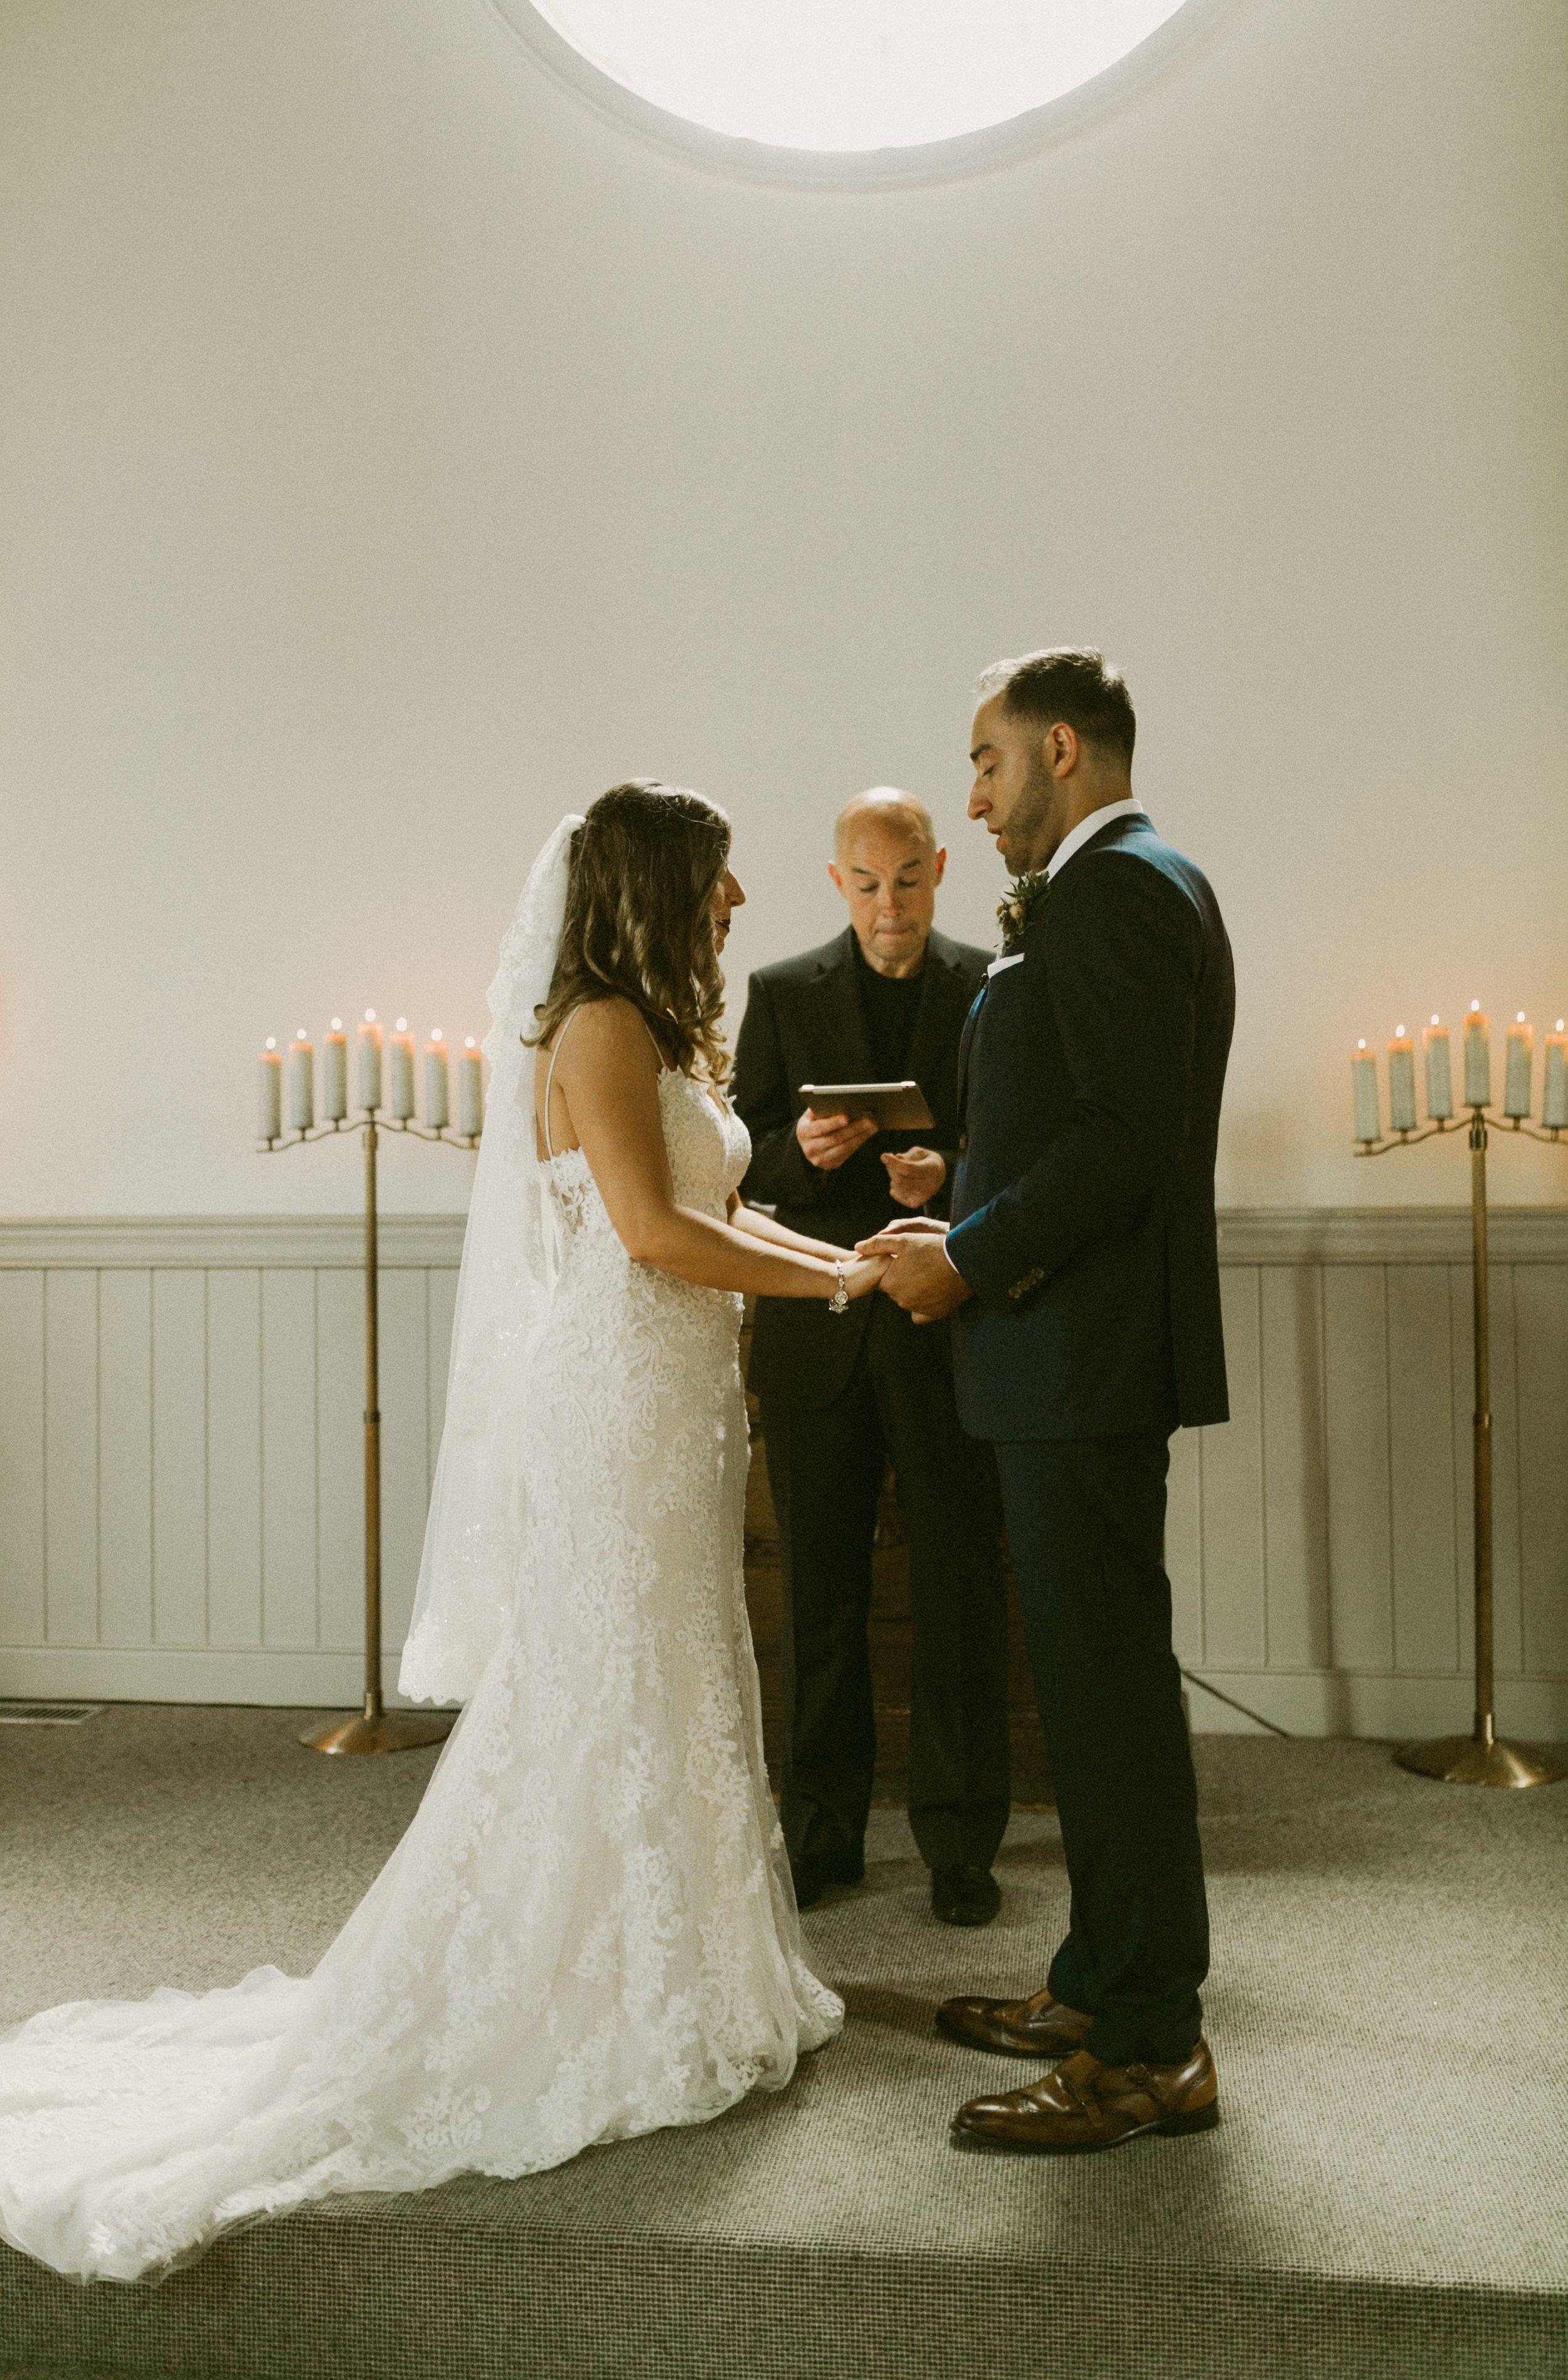 DanielaKamal_WEDDING_DOCTORSHOUSE_bisouseventsYAS-233ASE.jpg